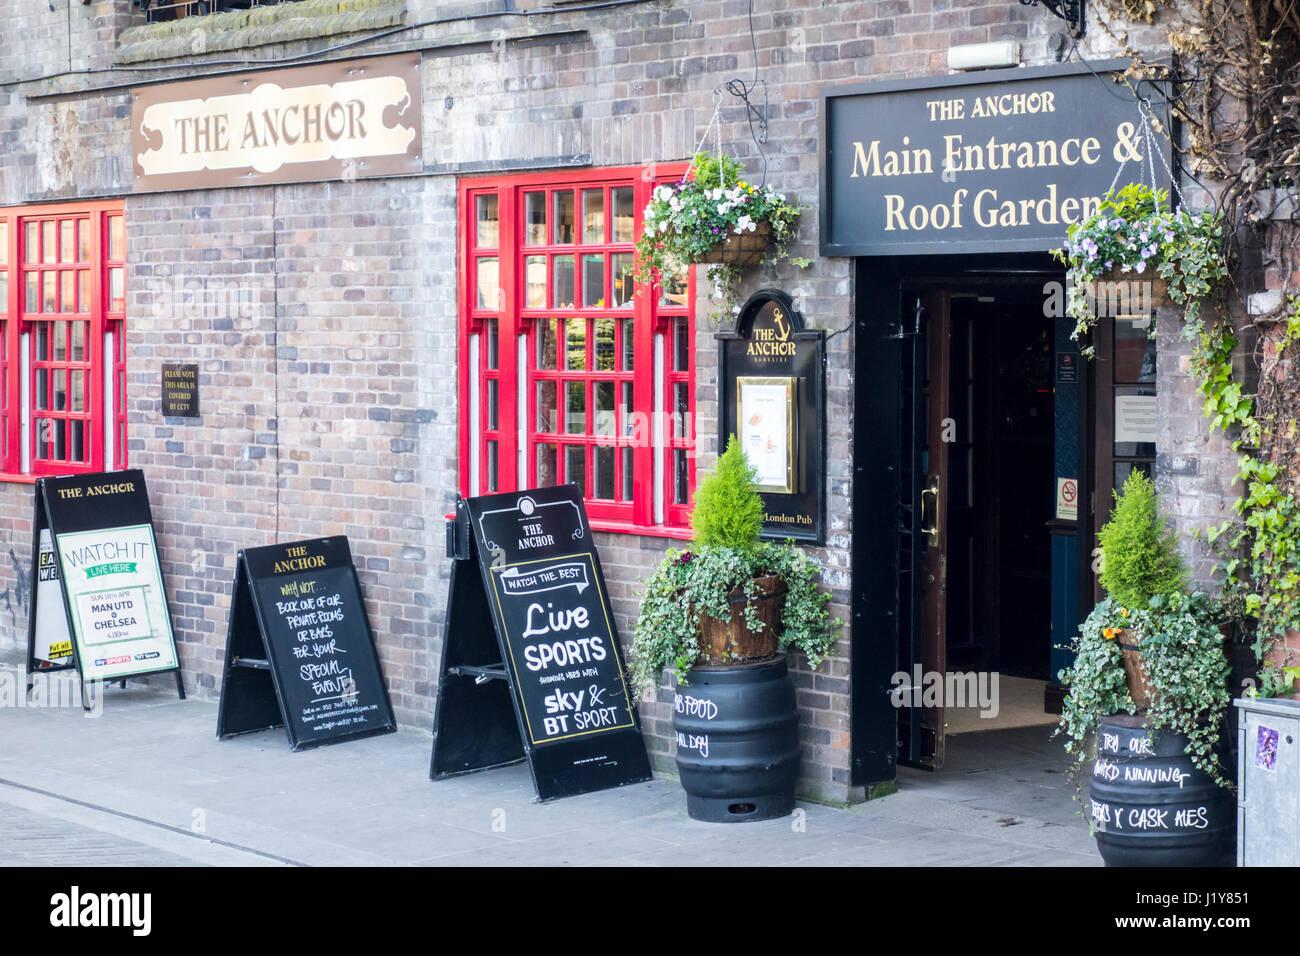 The Anchor Bankside, pub, public house, London, UK - Stock Image